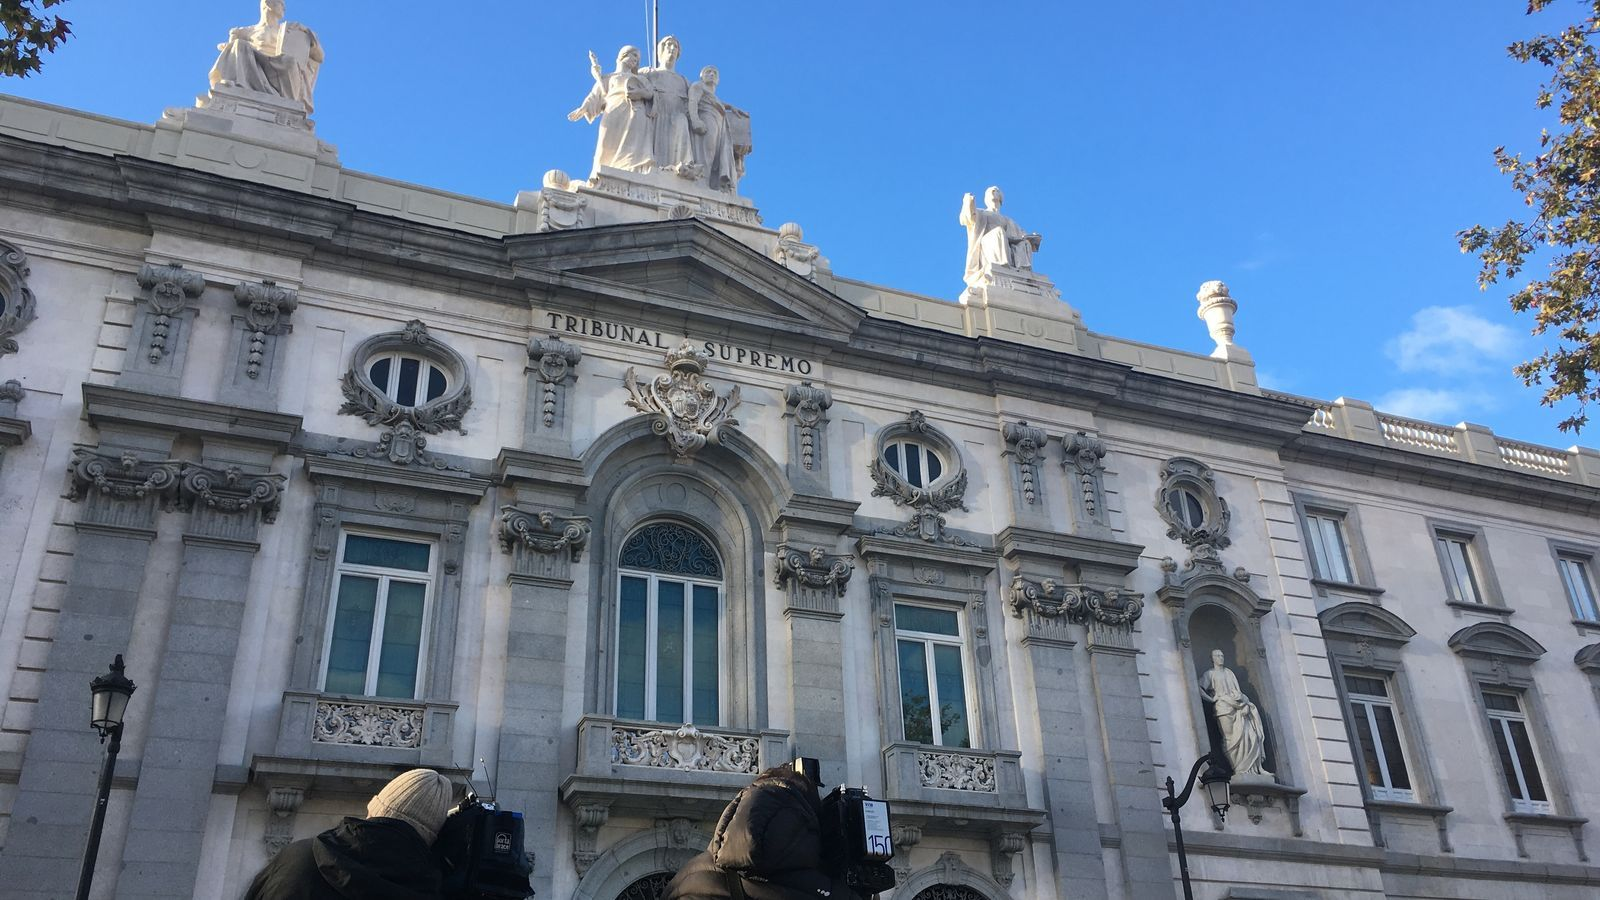 The Spanish Supreme Court / ARA